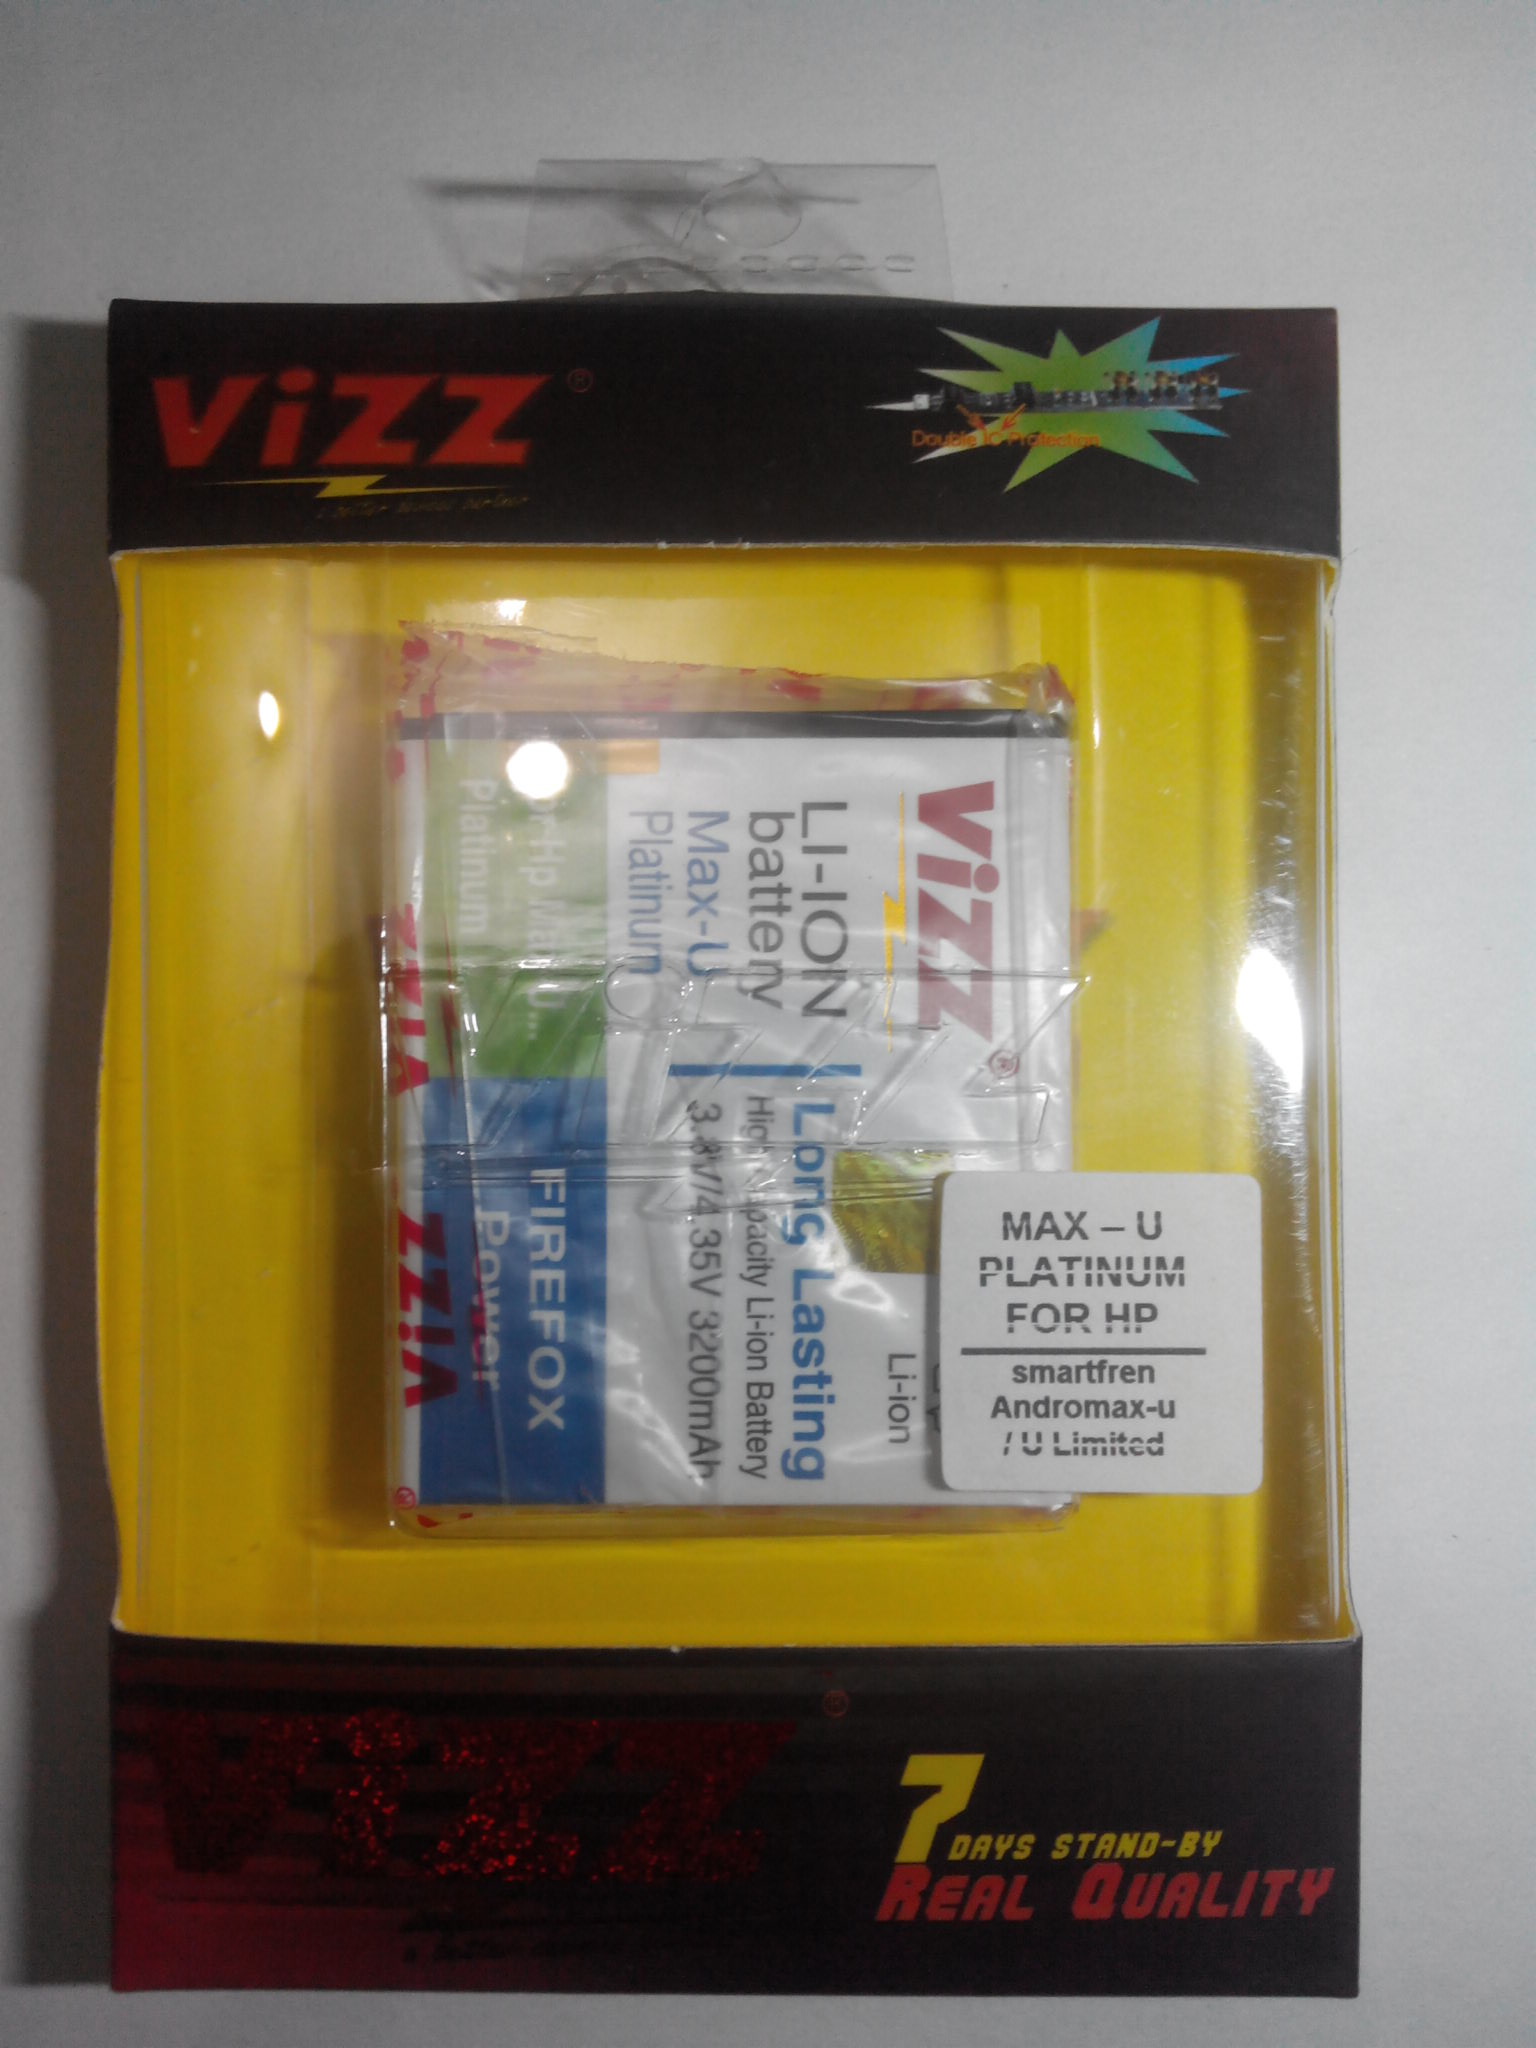 Vizz Baterai Batt Batre Battery Double Power Vizz Smartfren Andromax Source · 1101618 f79ab172 9b36 4dd5 8bb0 b7078fe4d209 jpg